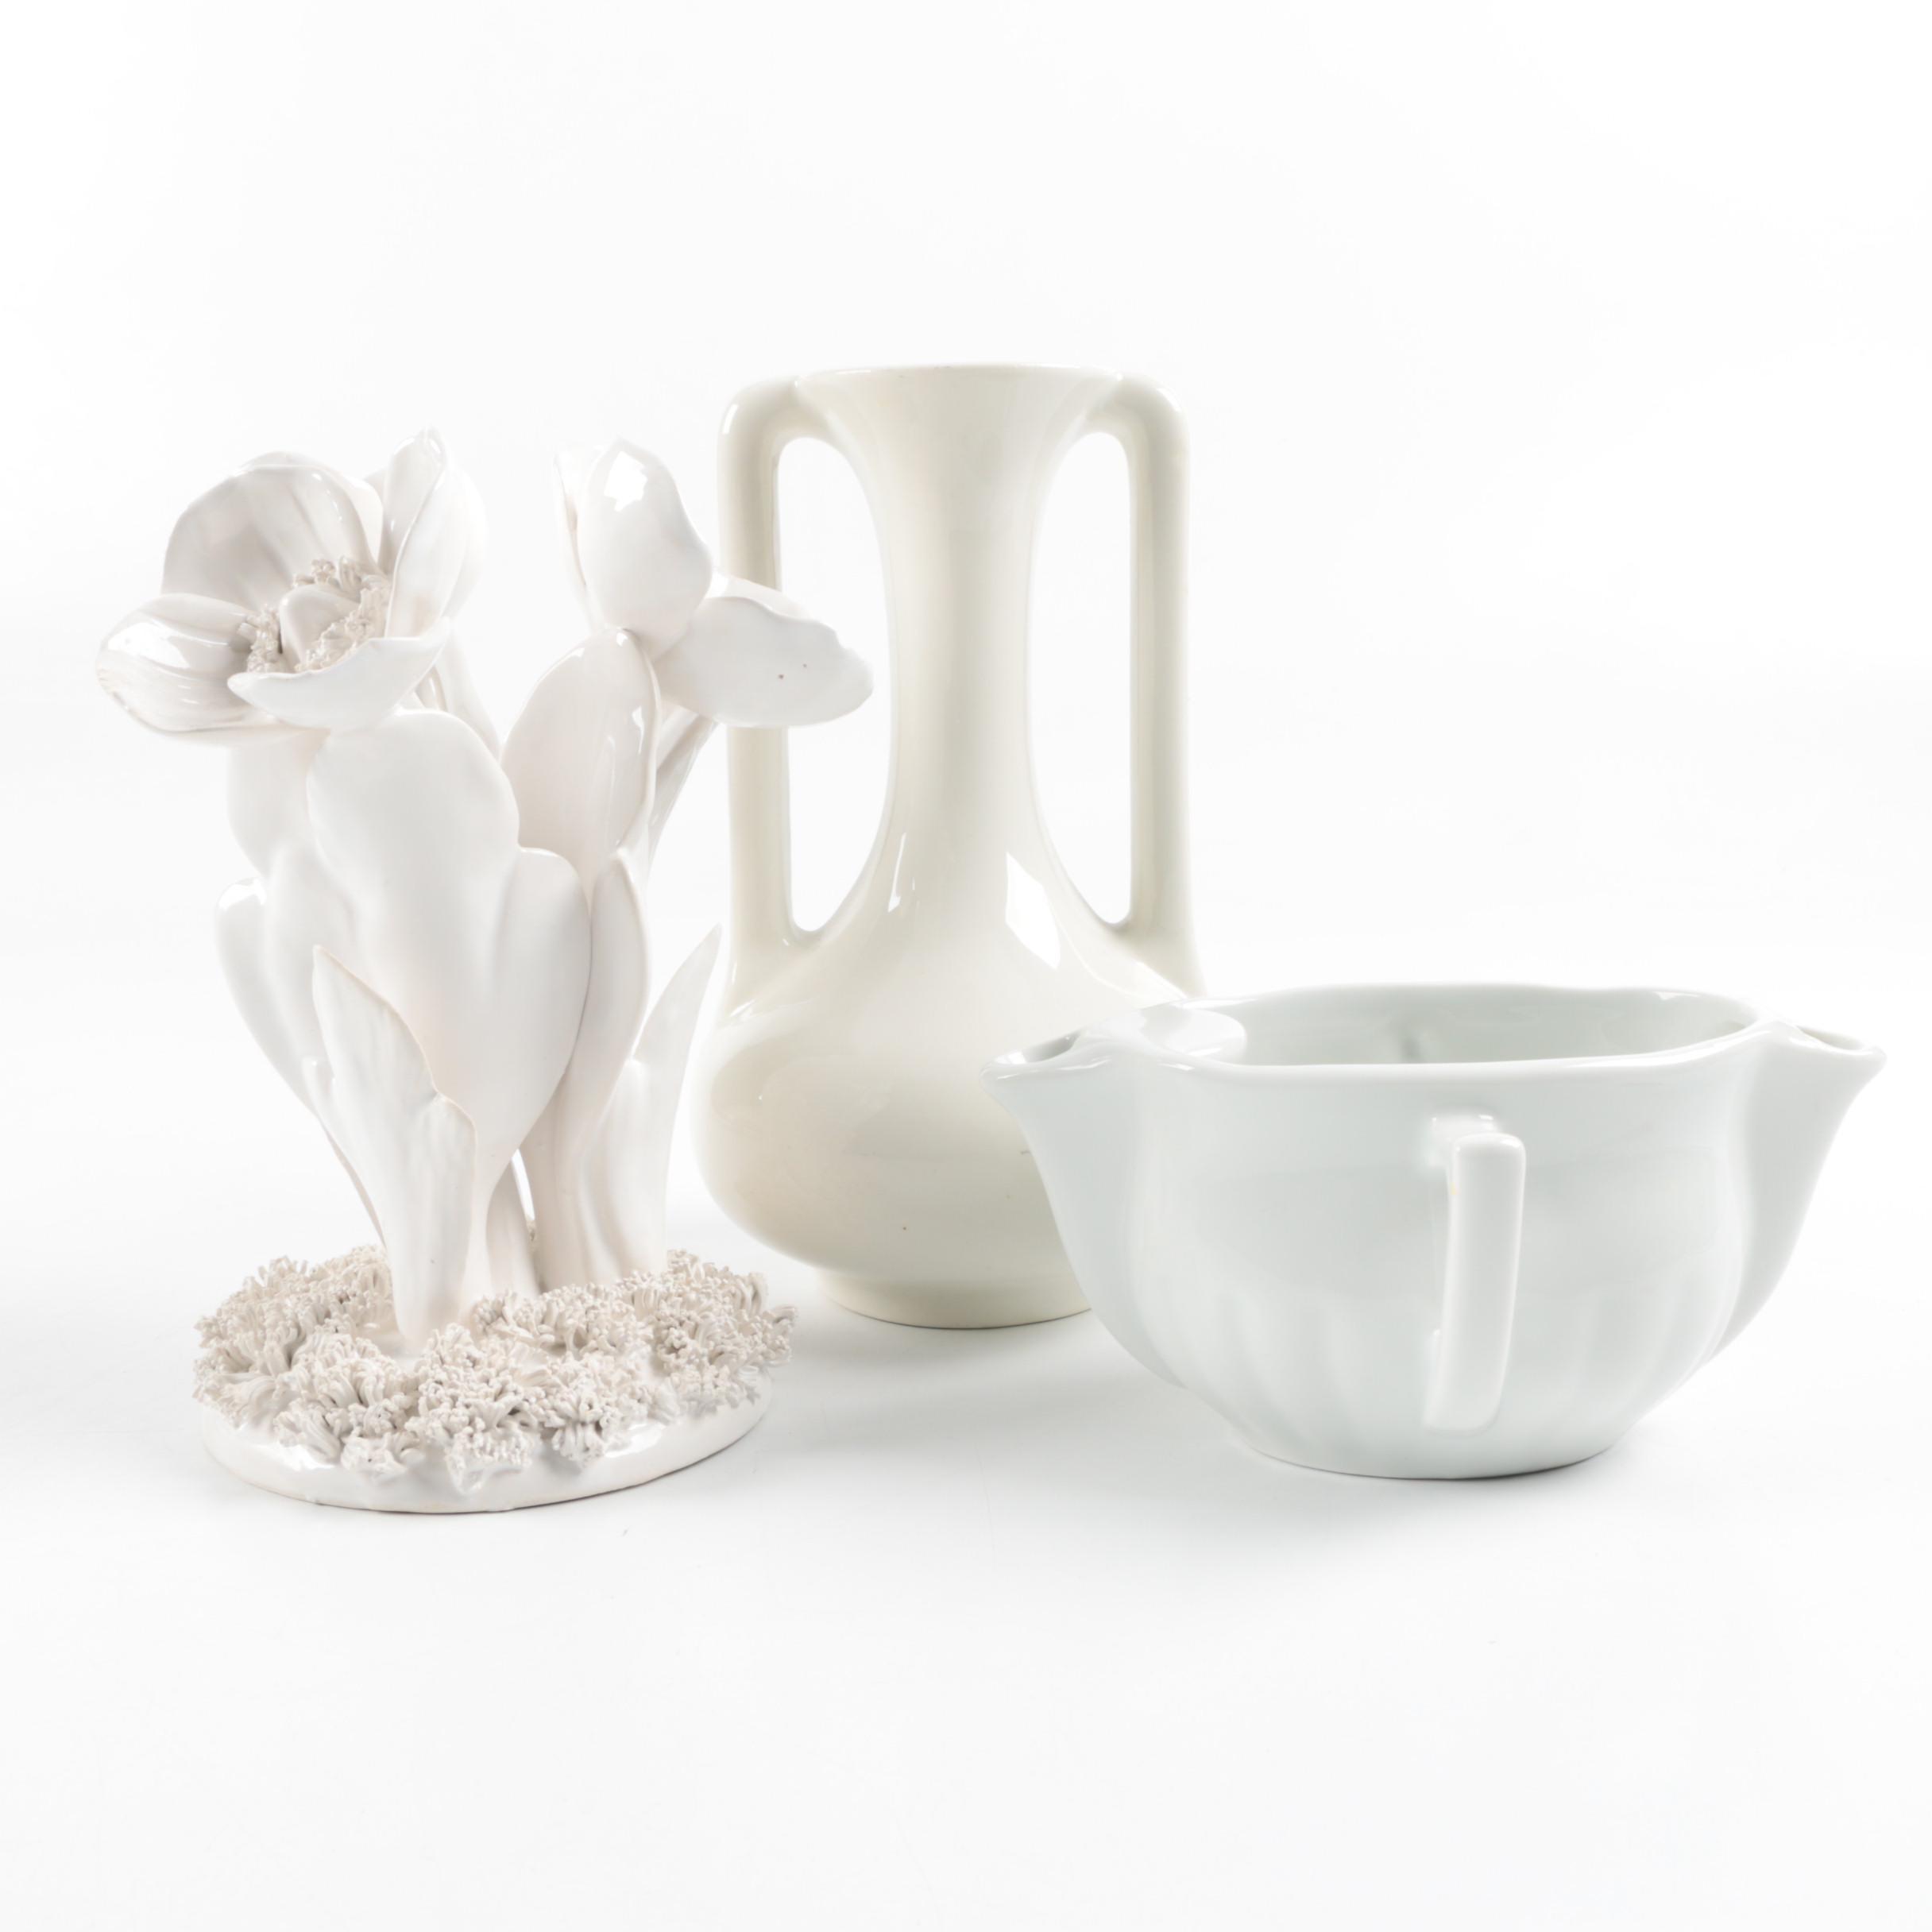 Set of White Ceramic Decor